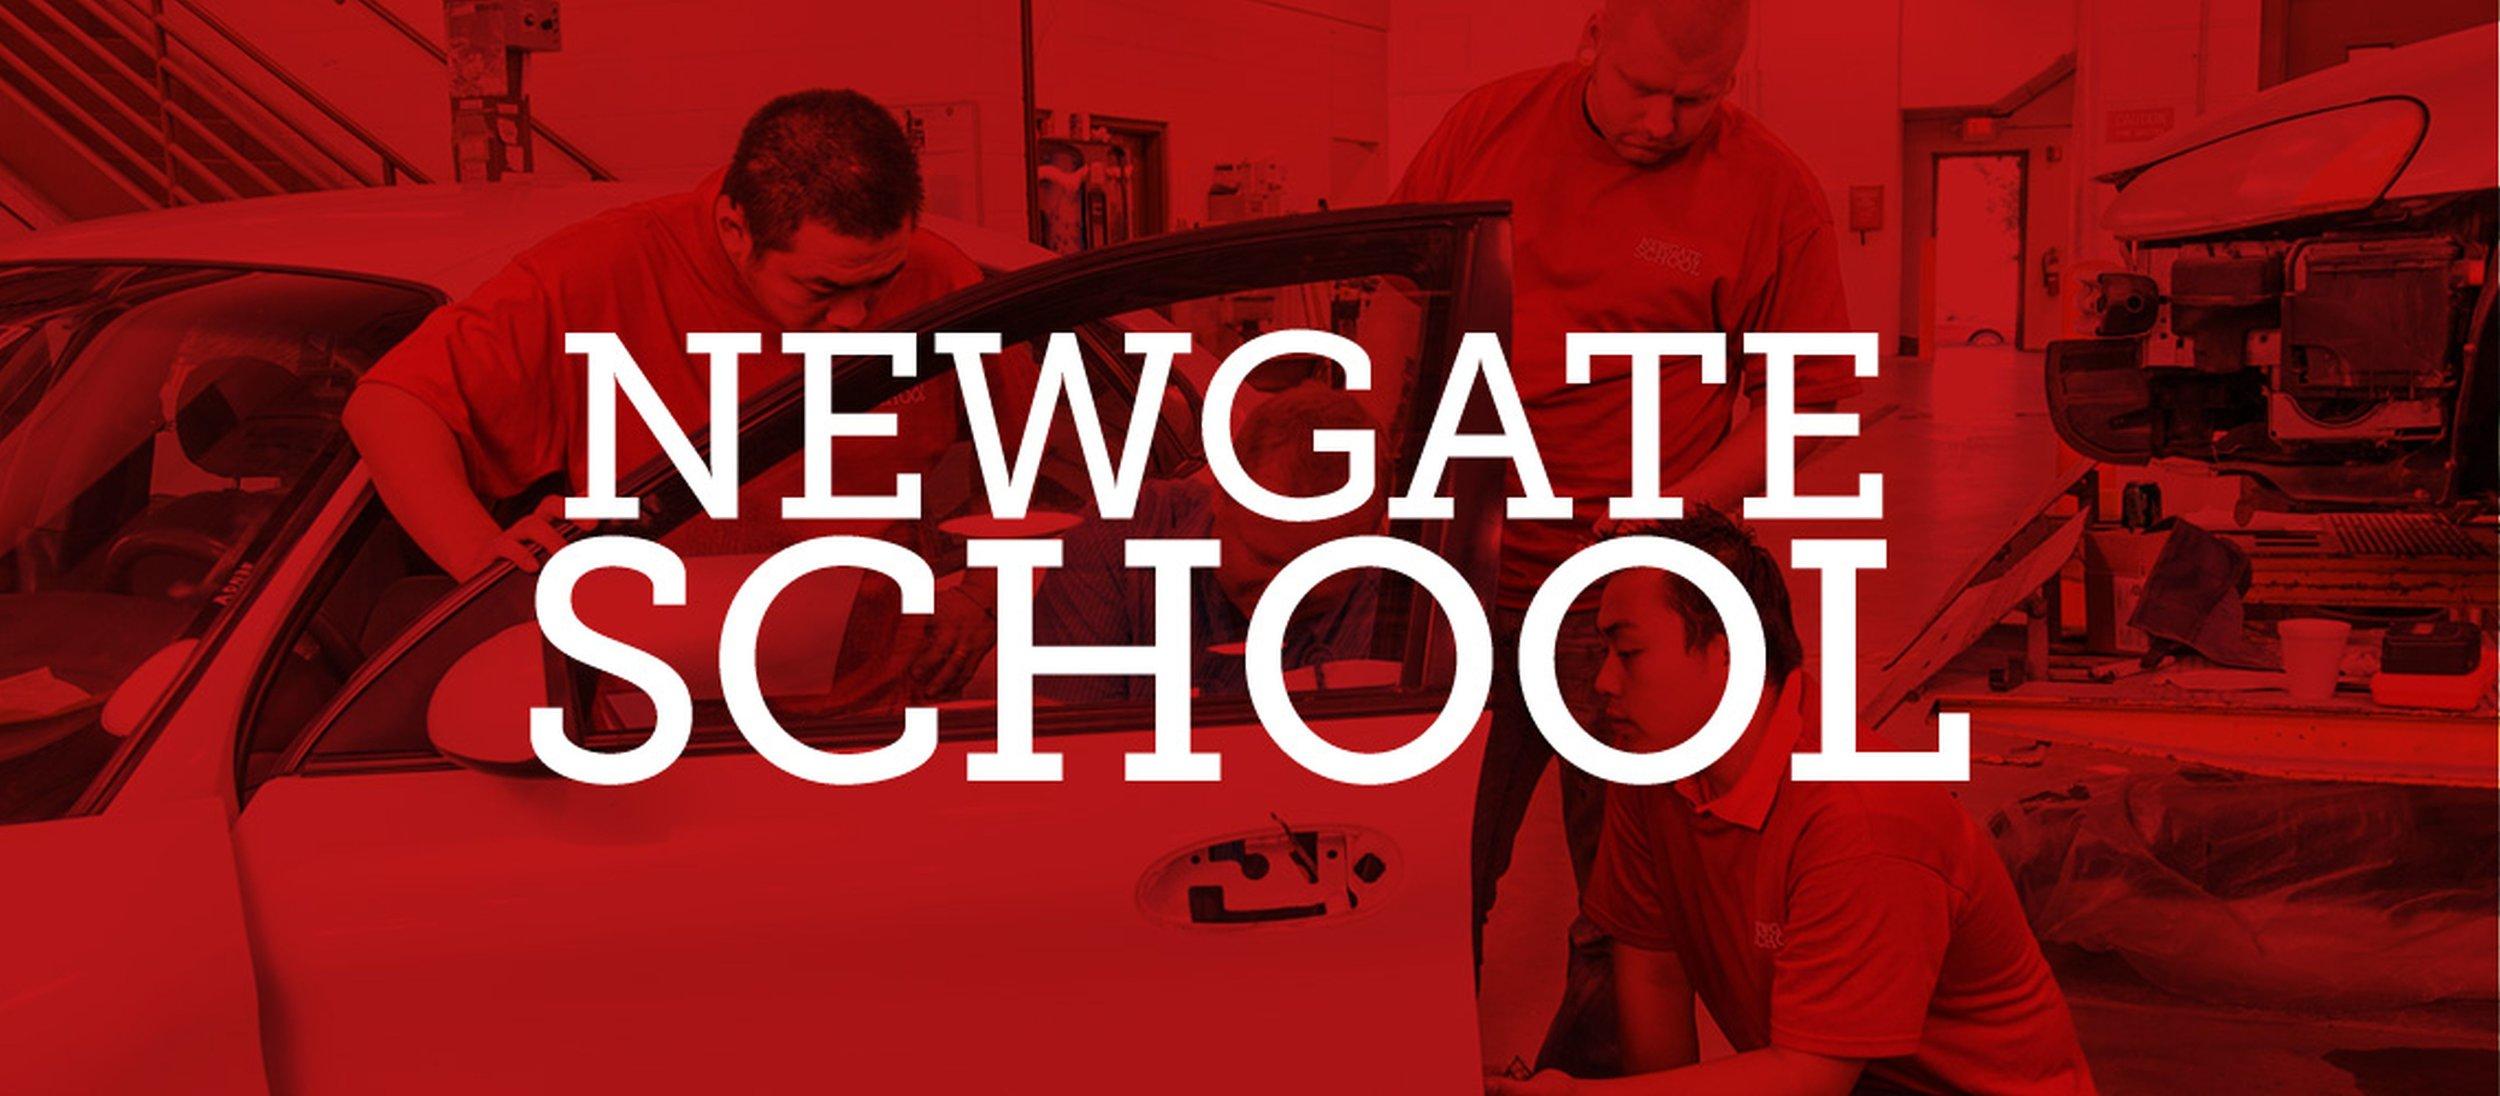 Newgate School Car Donation Program